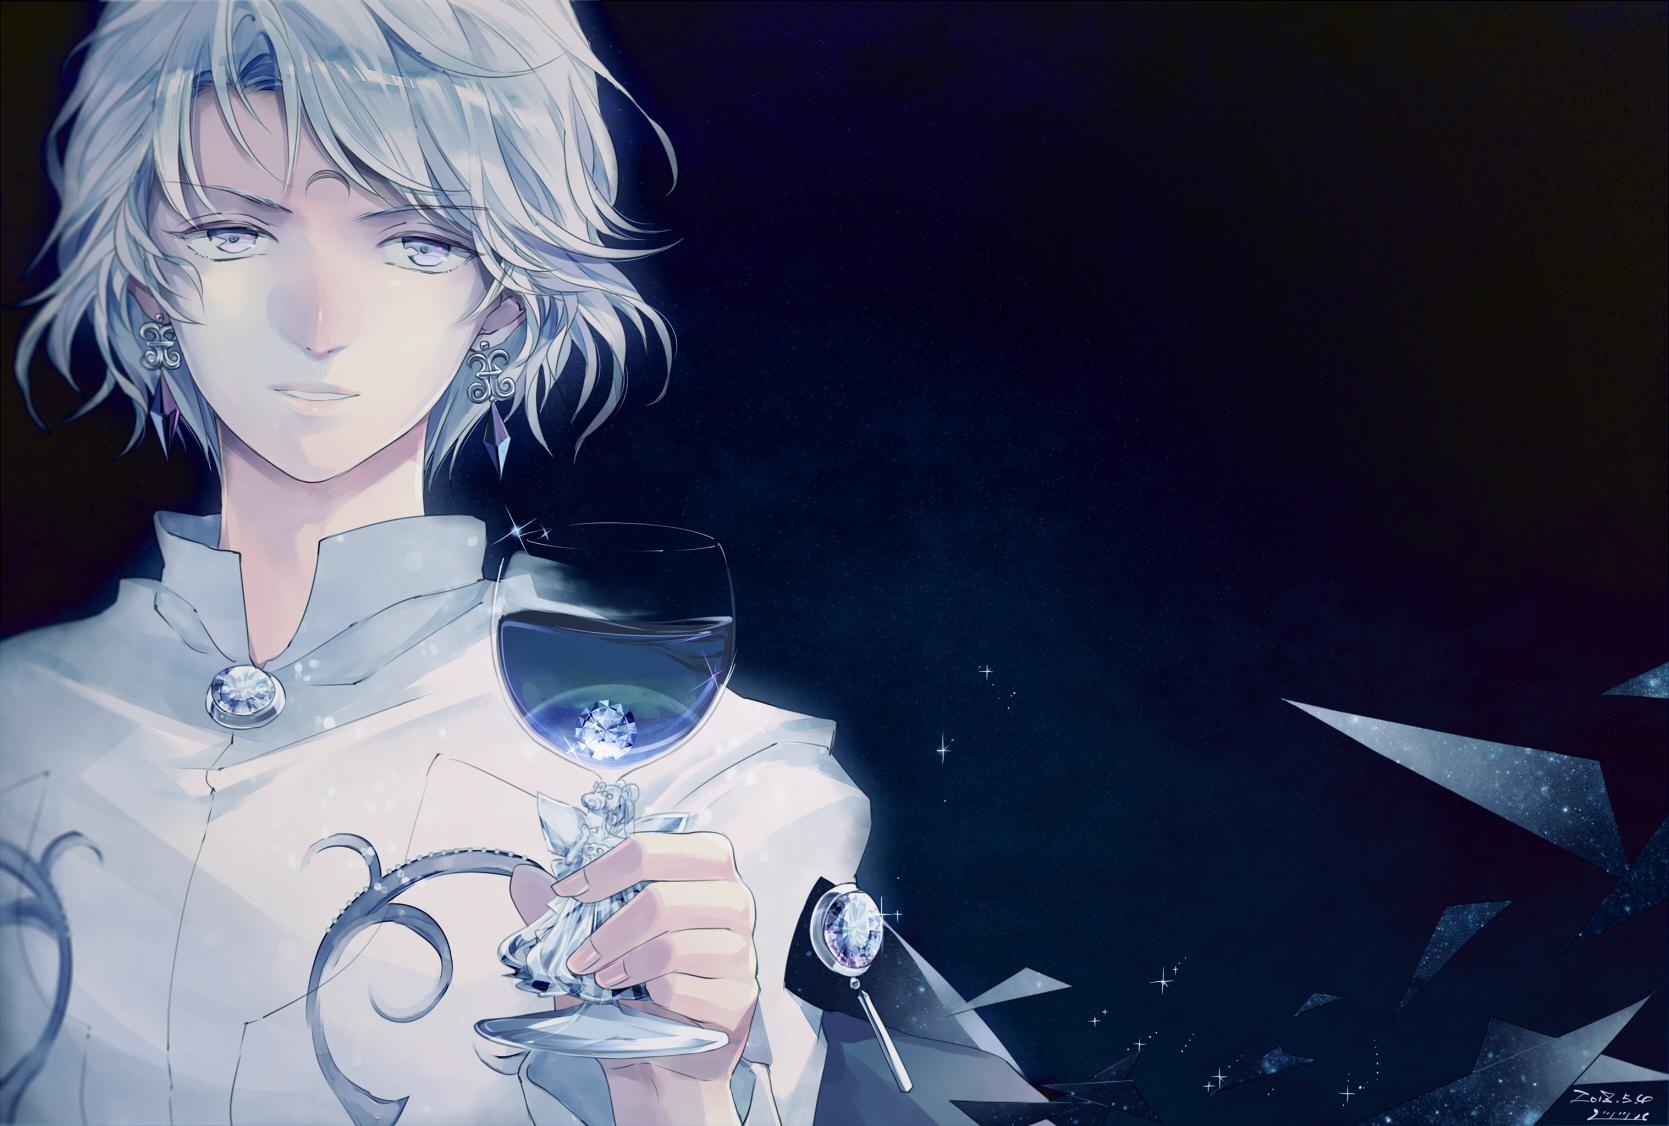 Bishoujo Senshi Sailor Moon (Pretty Guardian Sailor Moon) Image #3083093 - Zerochan Anime Image